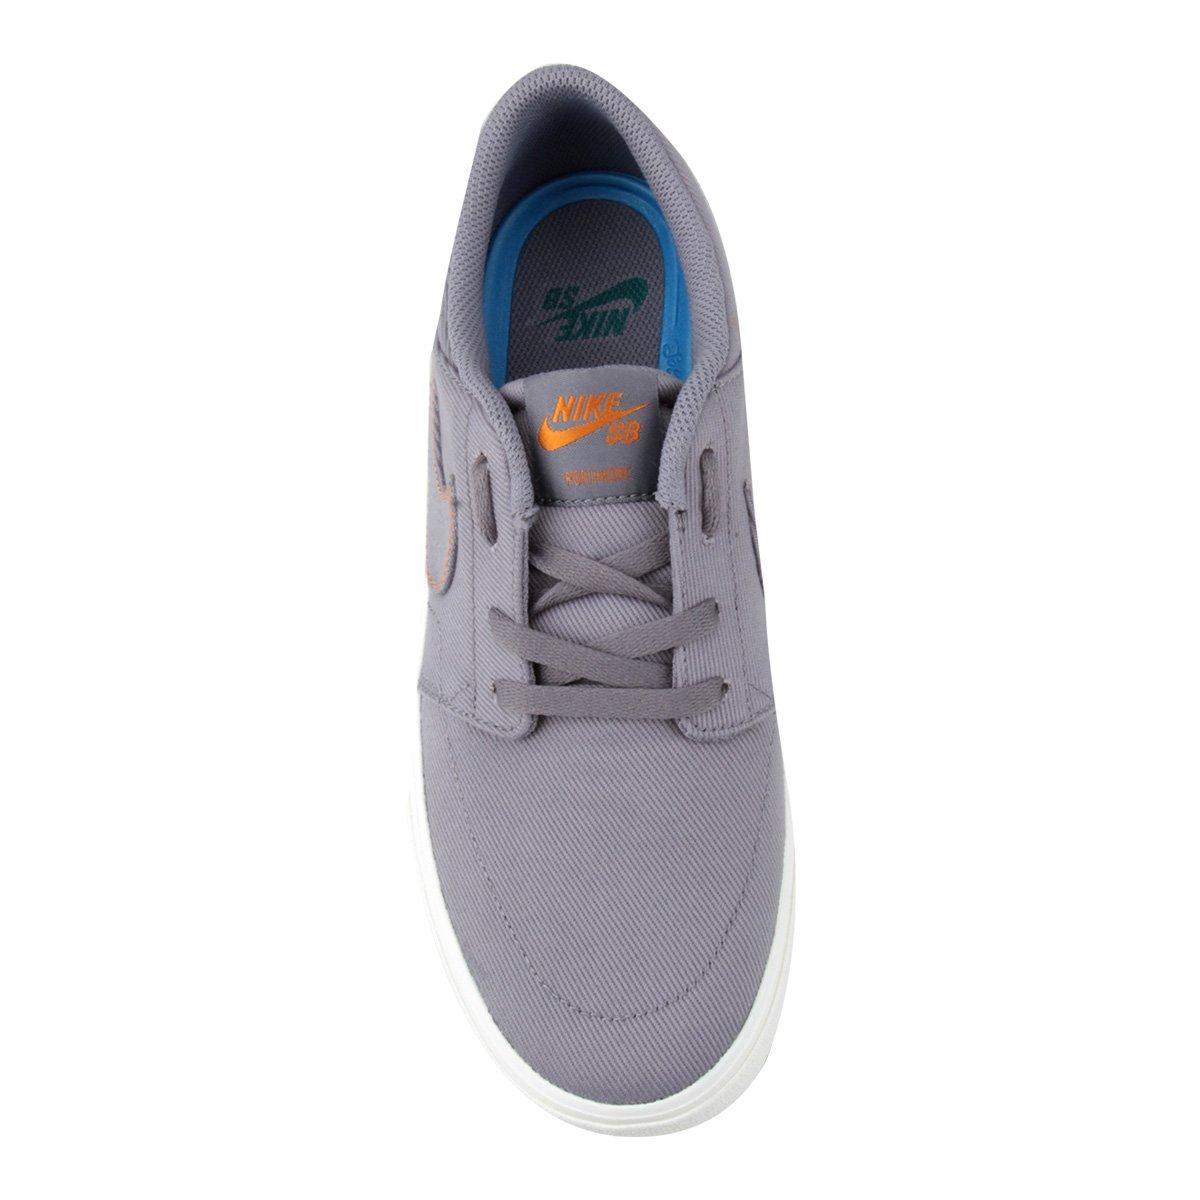 346e343ec5 Tênis Nike SB Solarsoft Portmore II Feminino